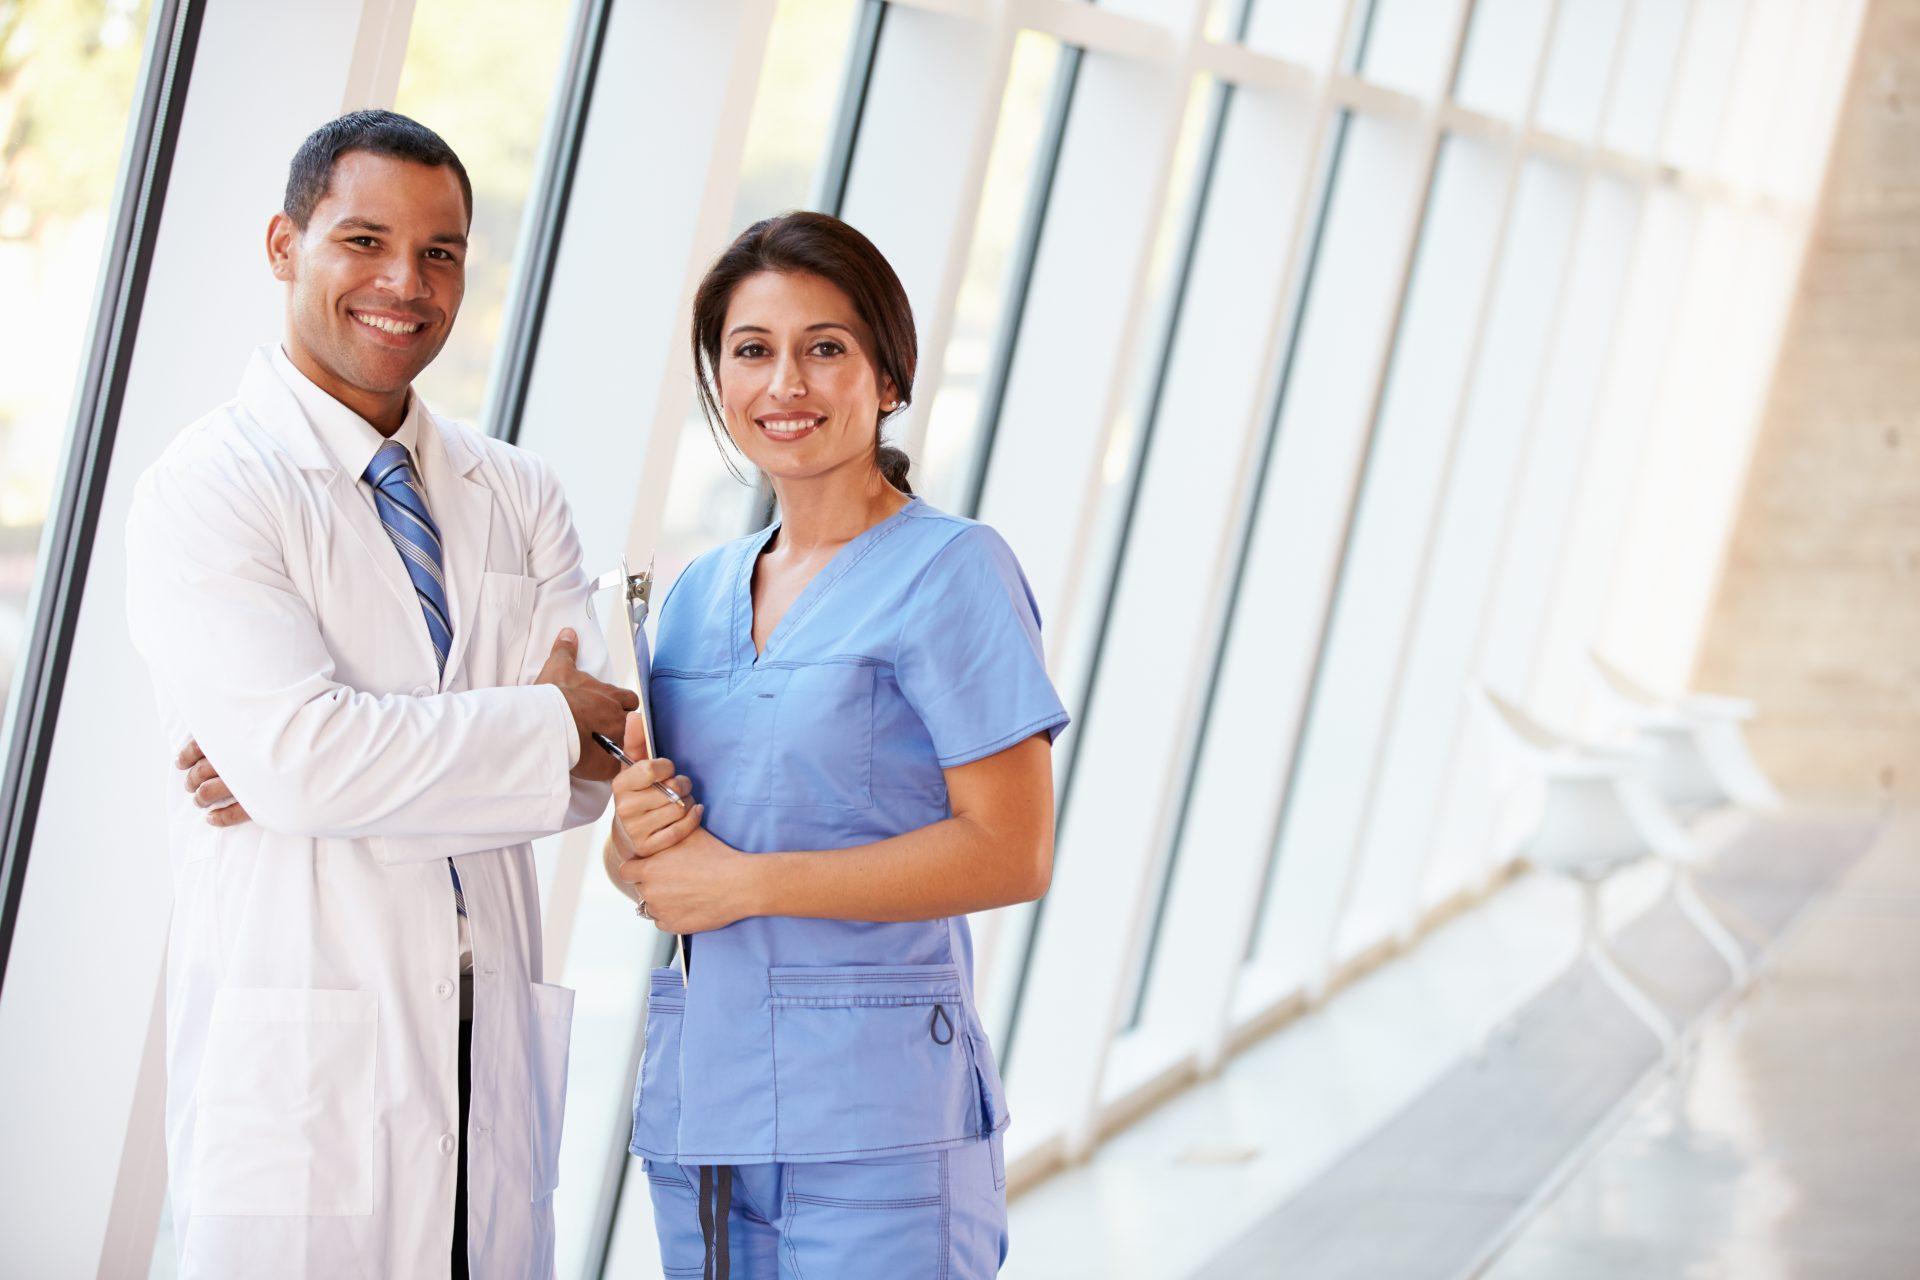 travel nurse to permanent employment